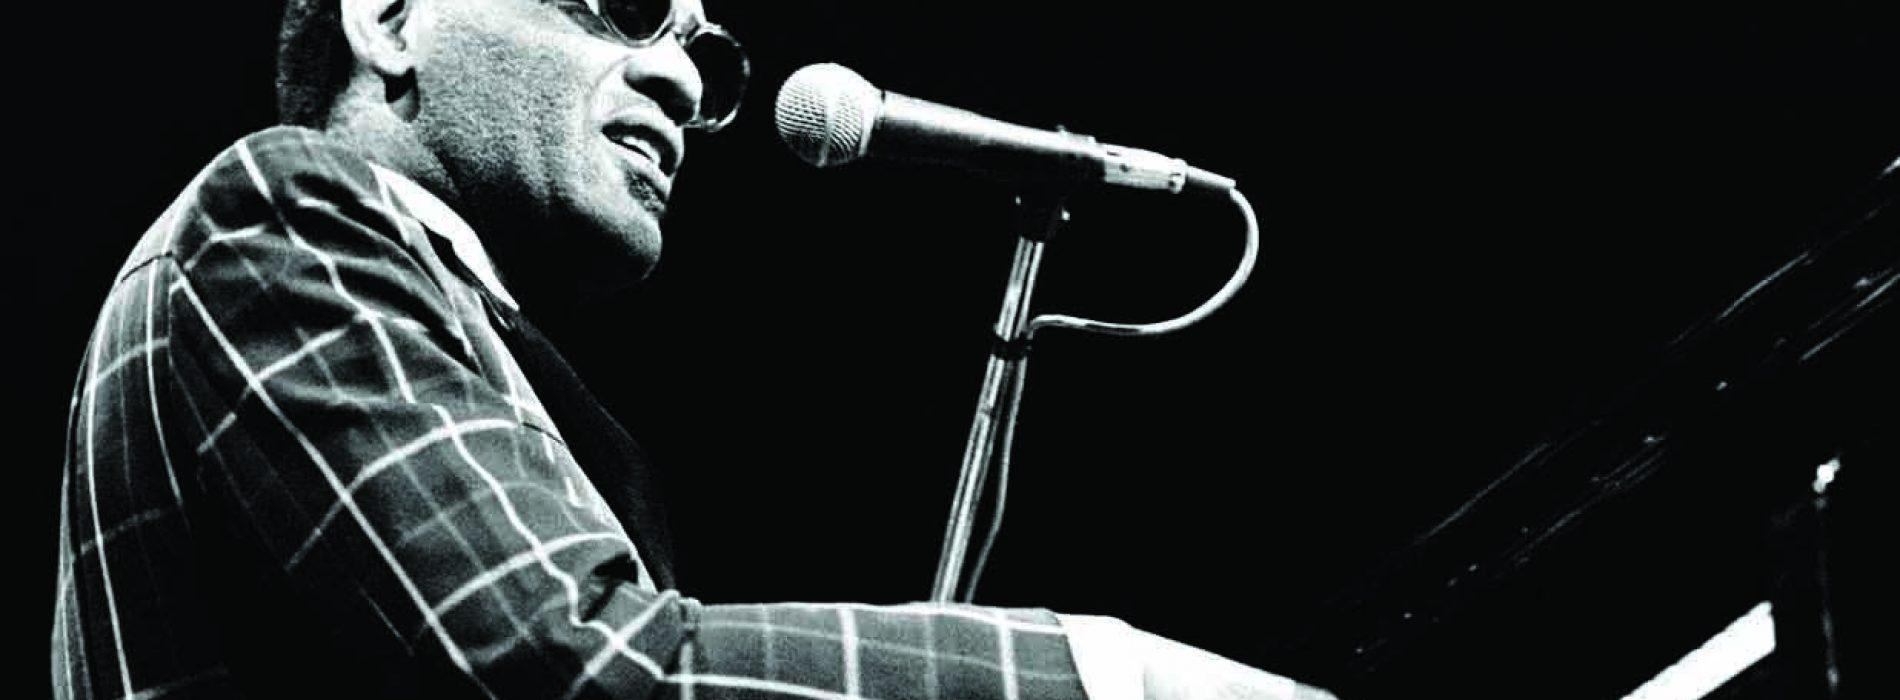 Ray Charles and true blind faith